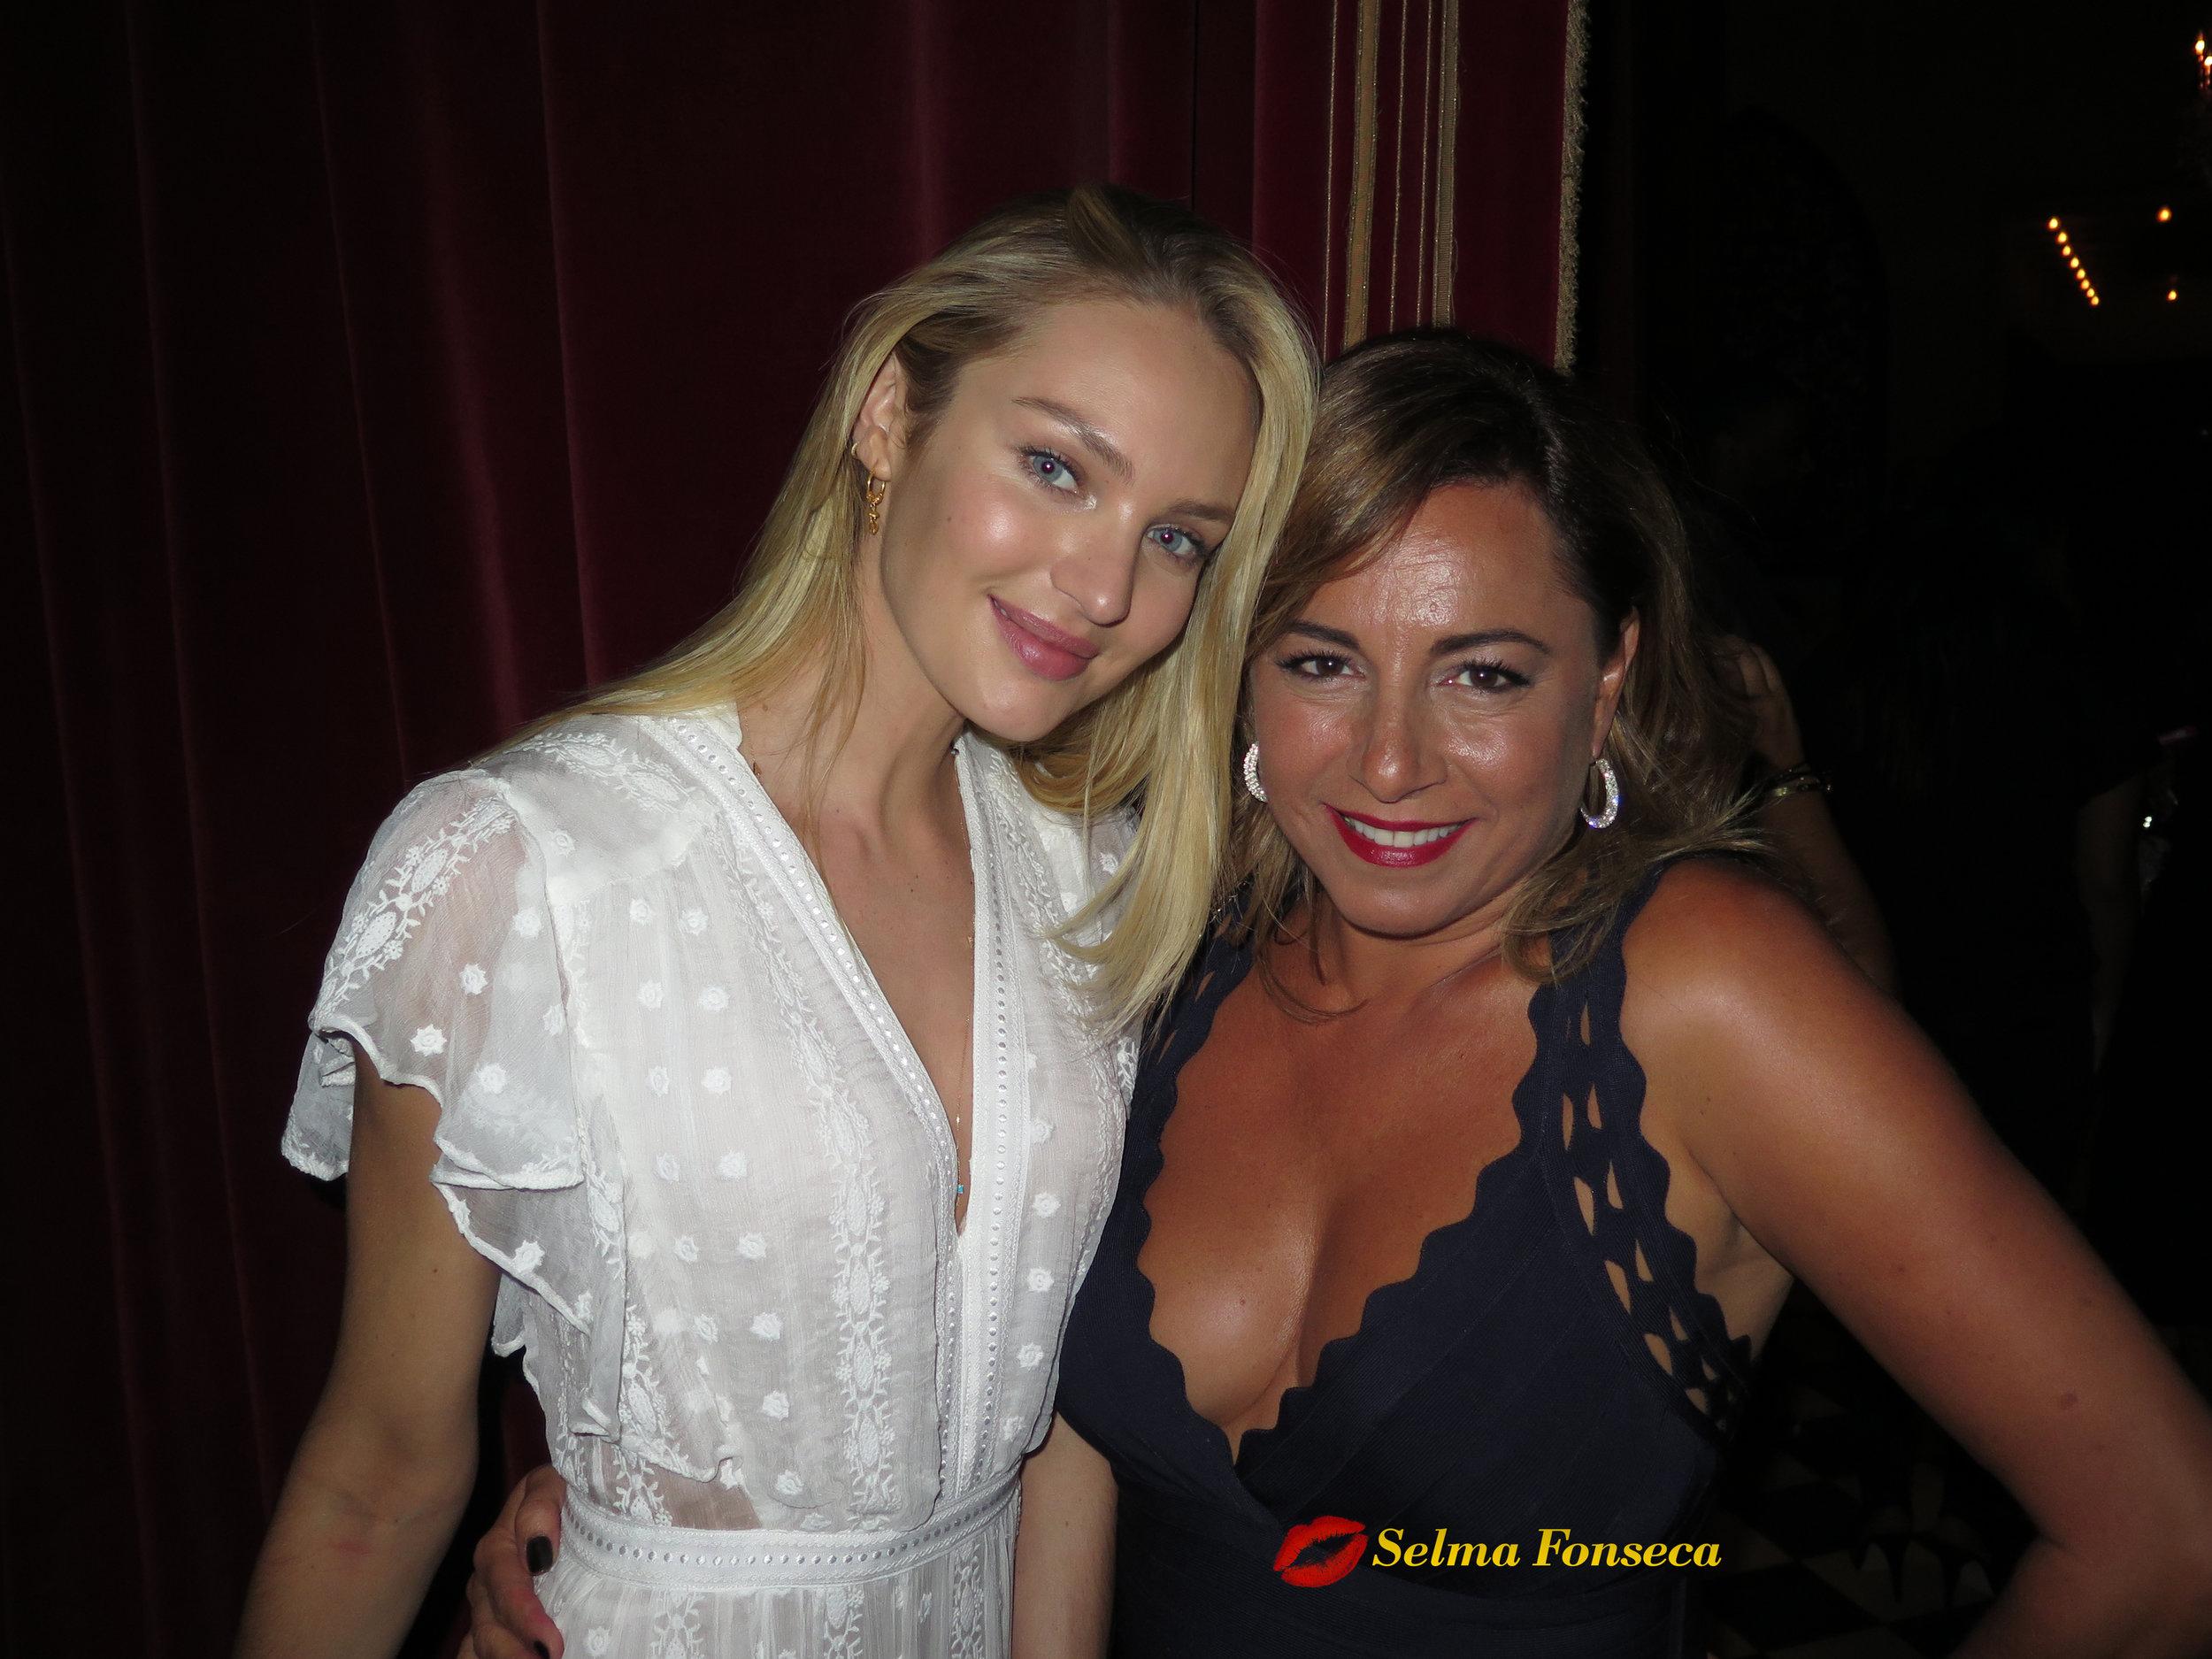 Candice Swanepoel Selma Fonseca.JPG